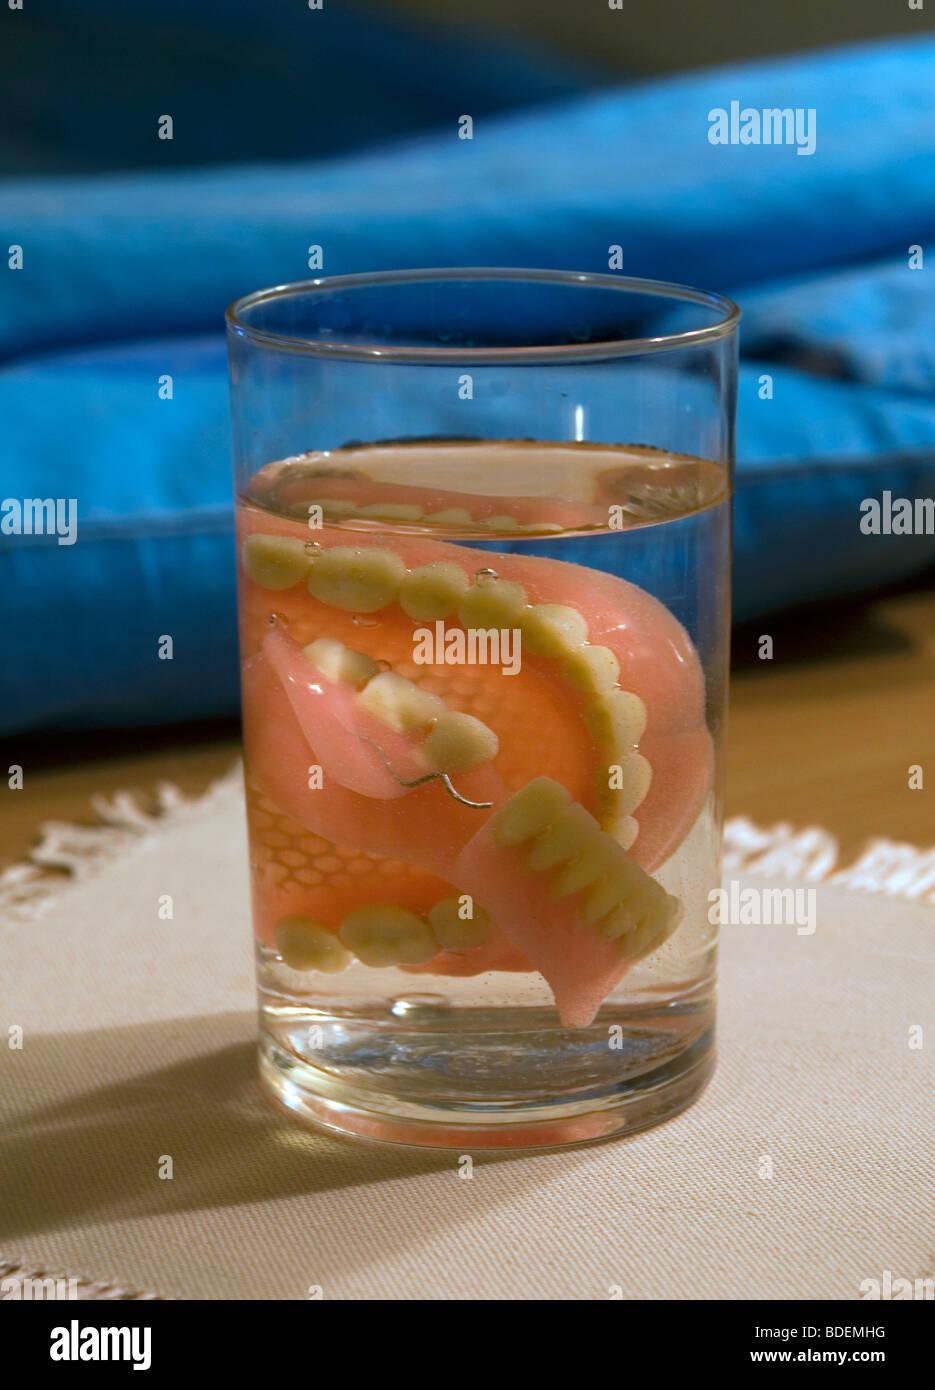 Denture in glass - Stock Image